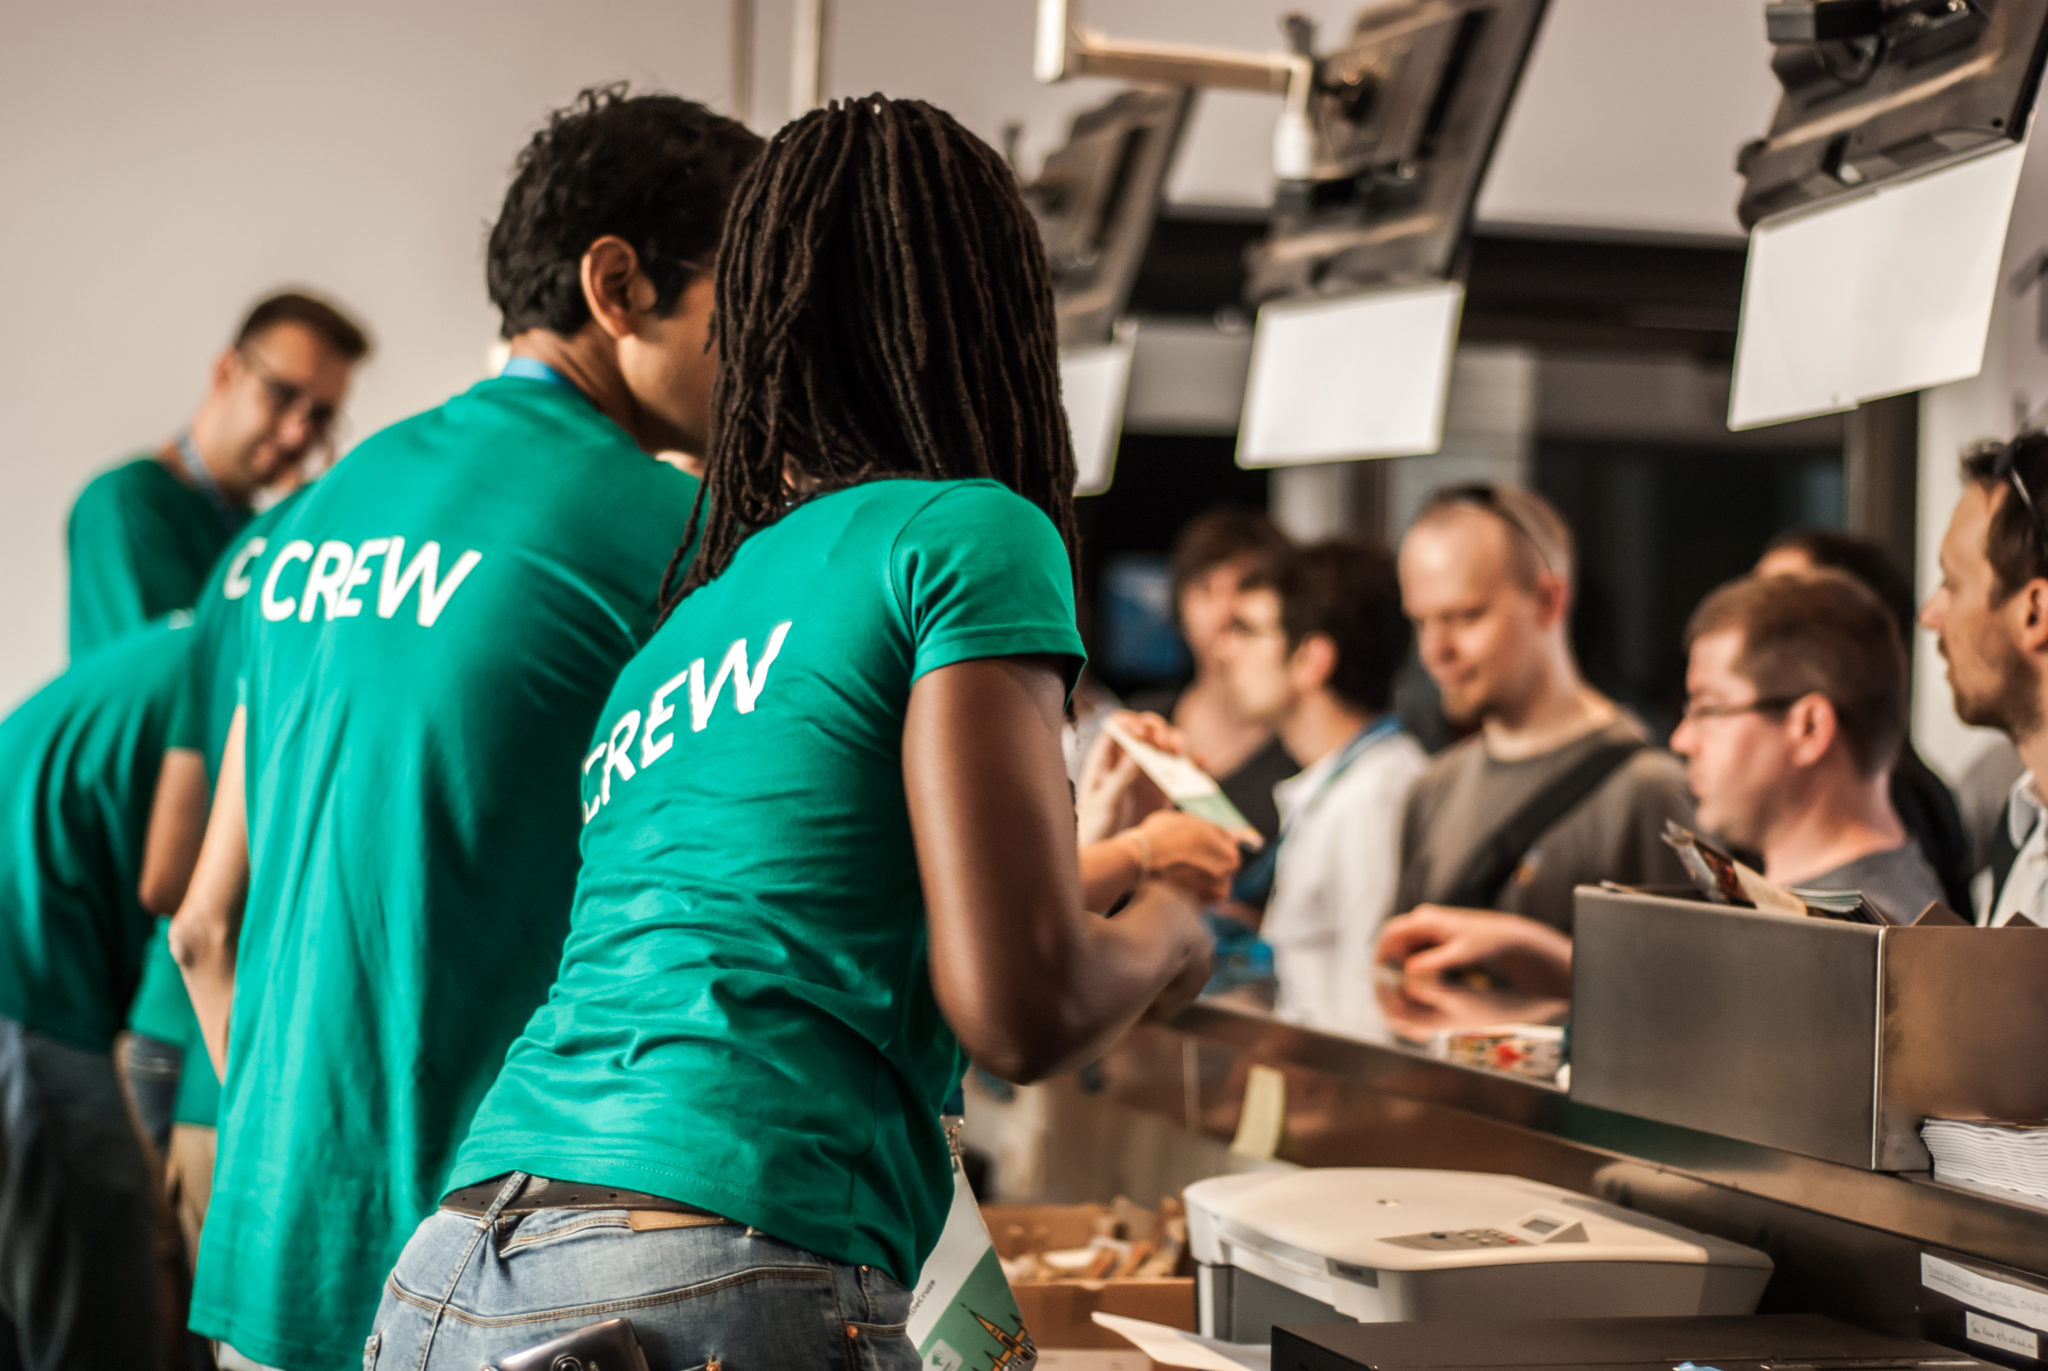 Crew providing customer service